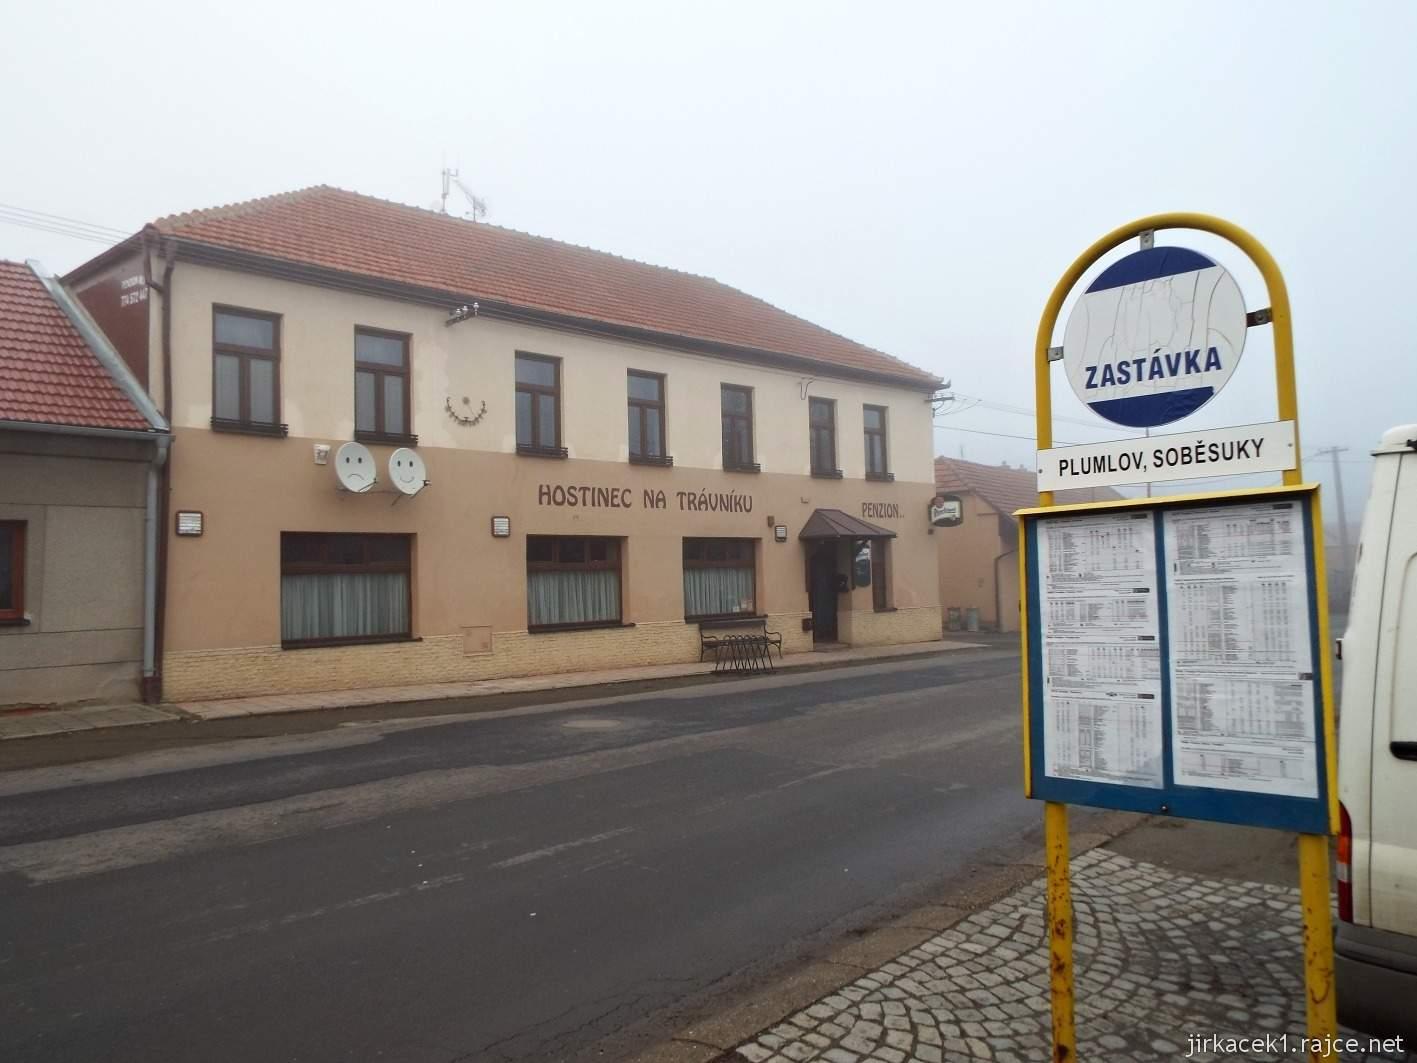 107 - autobusová zastávka a hospoda Na trávníku v obci Soběsuky